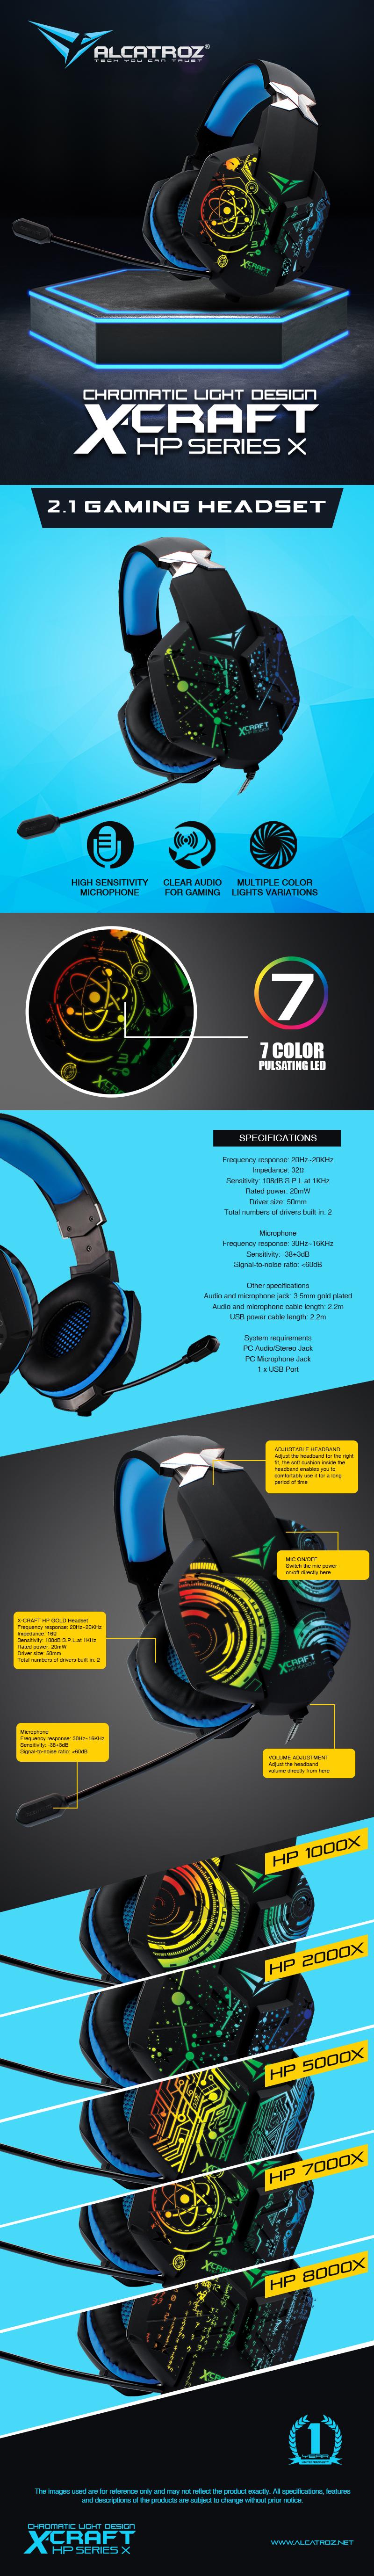 eDM-X-Craft-HP-Series-X